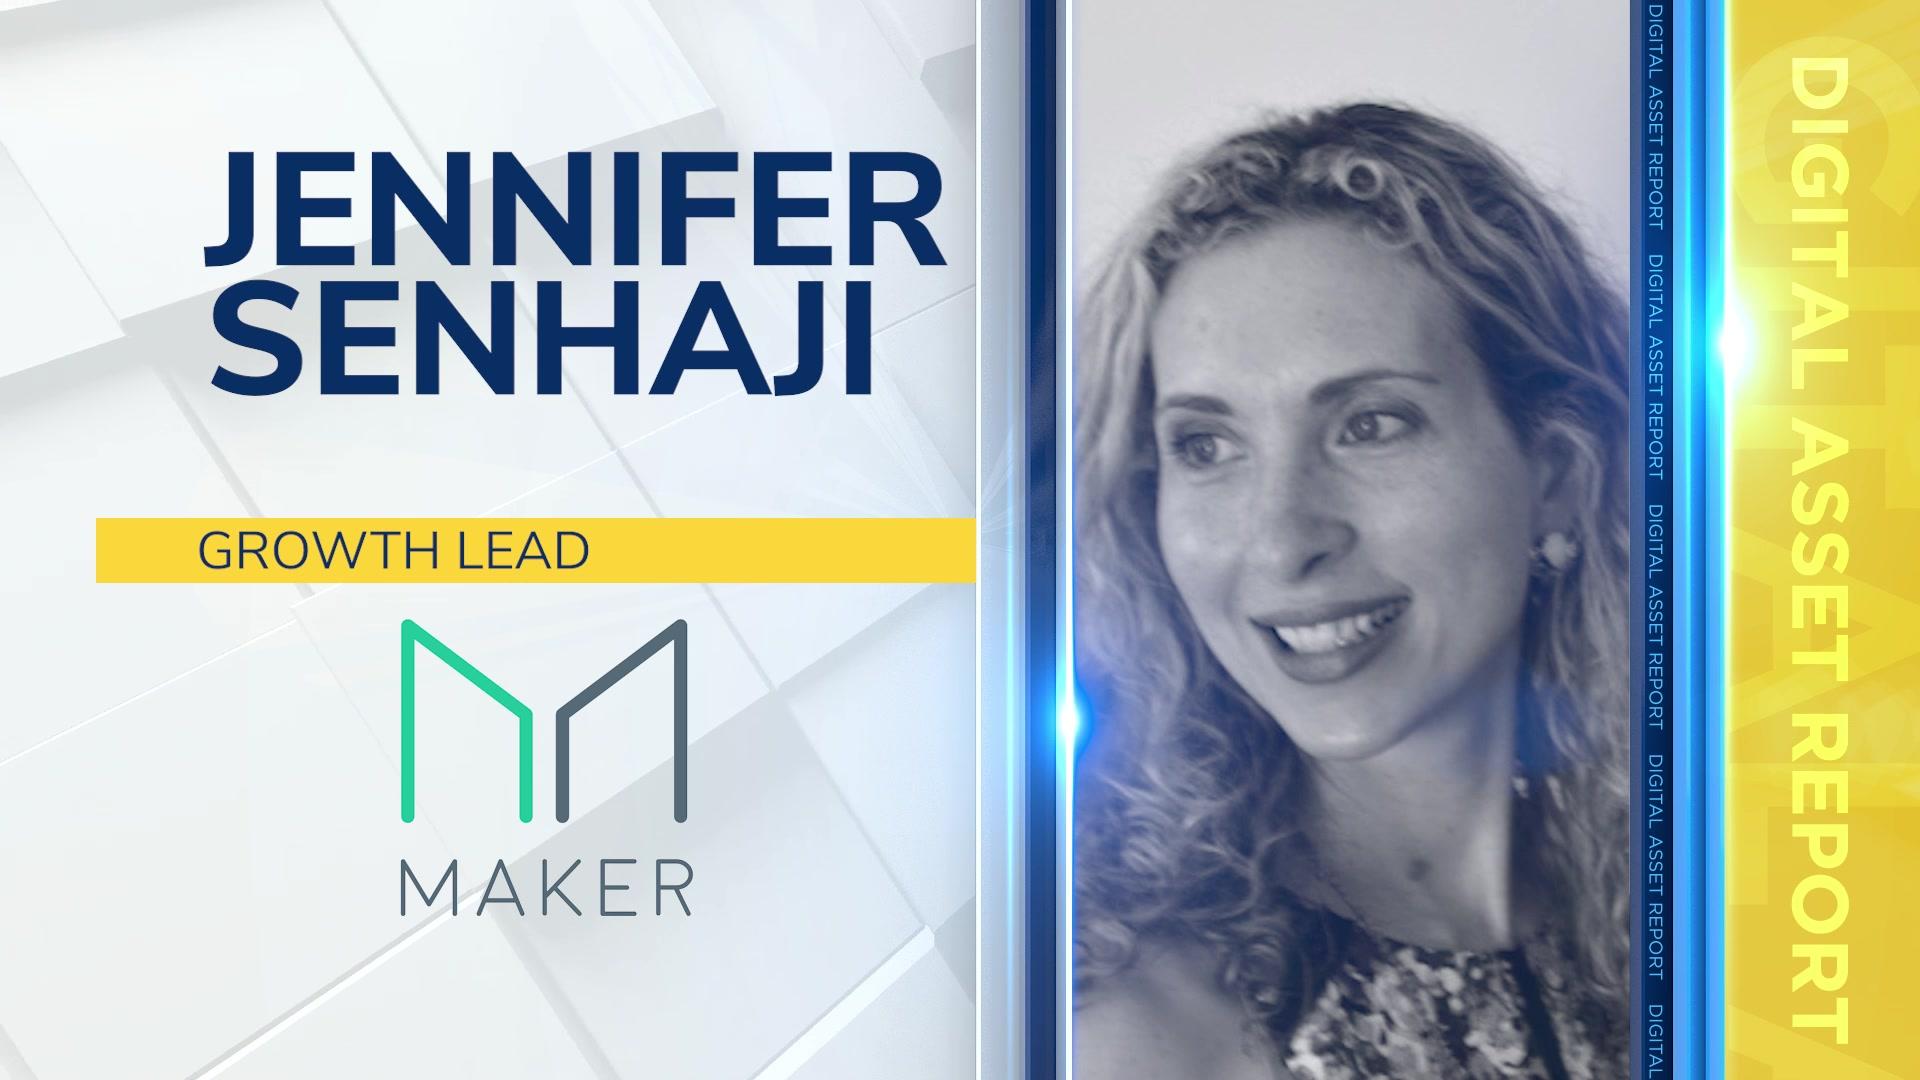 Jennifer Senhaji, Growth Lead at MakerDAO